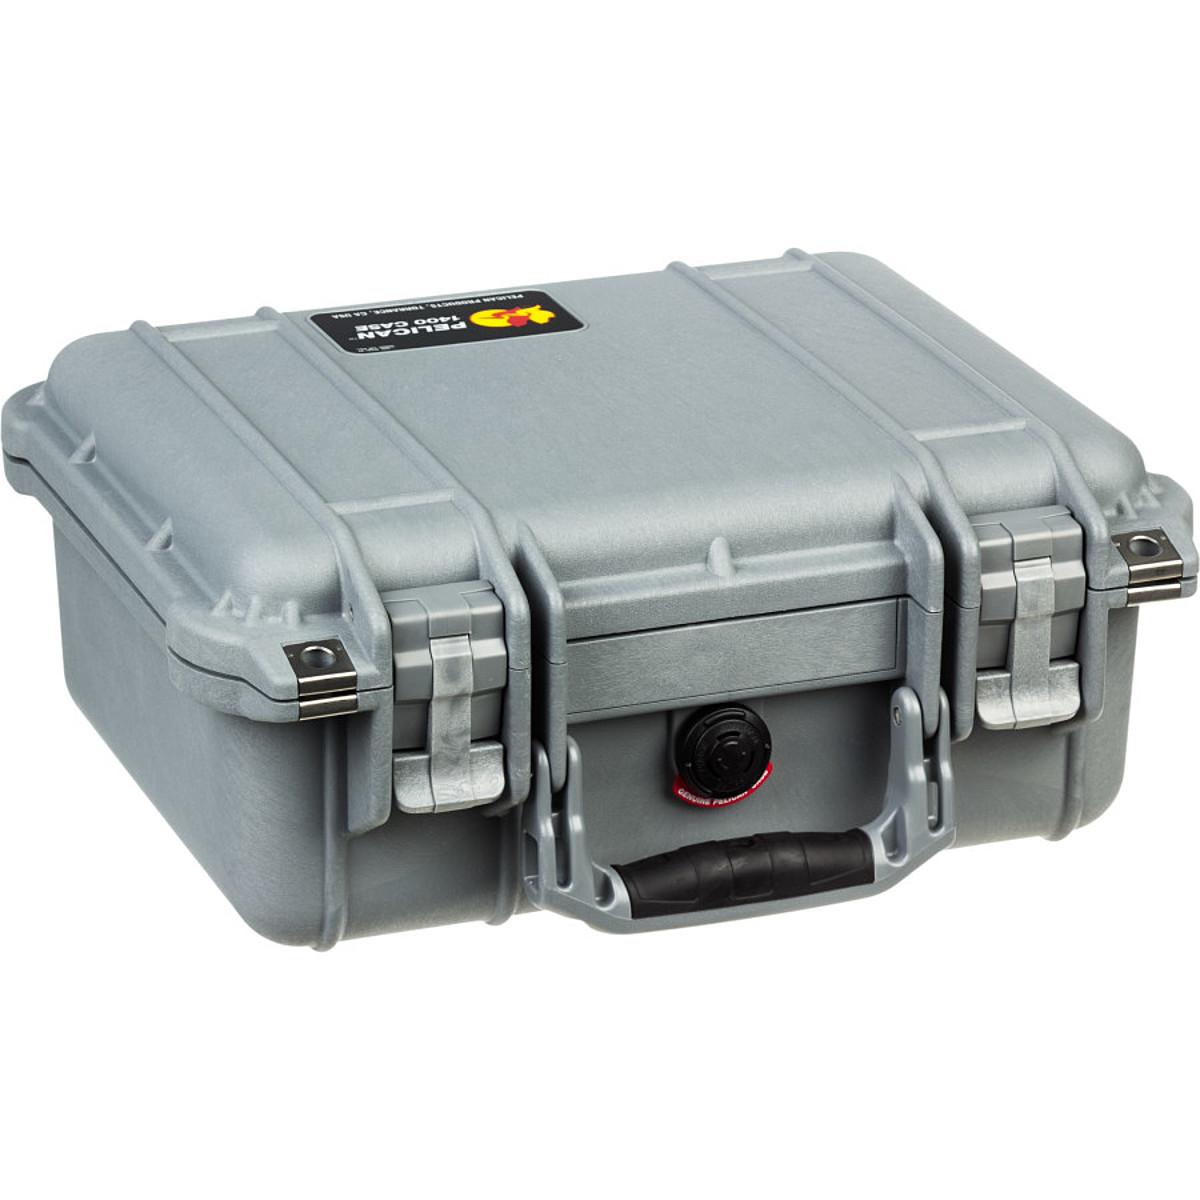 NRS Pelican Case - 1400